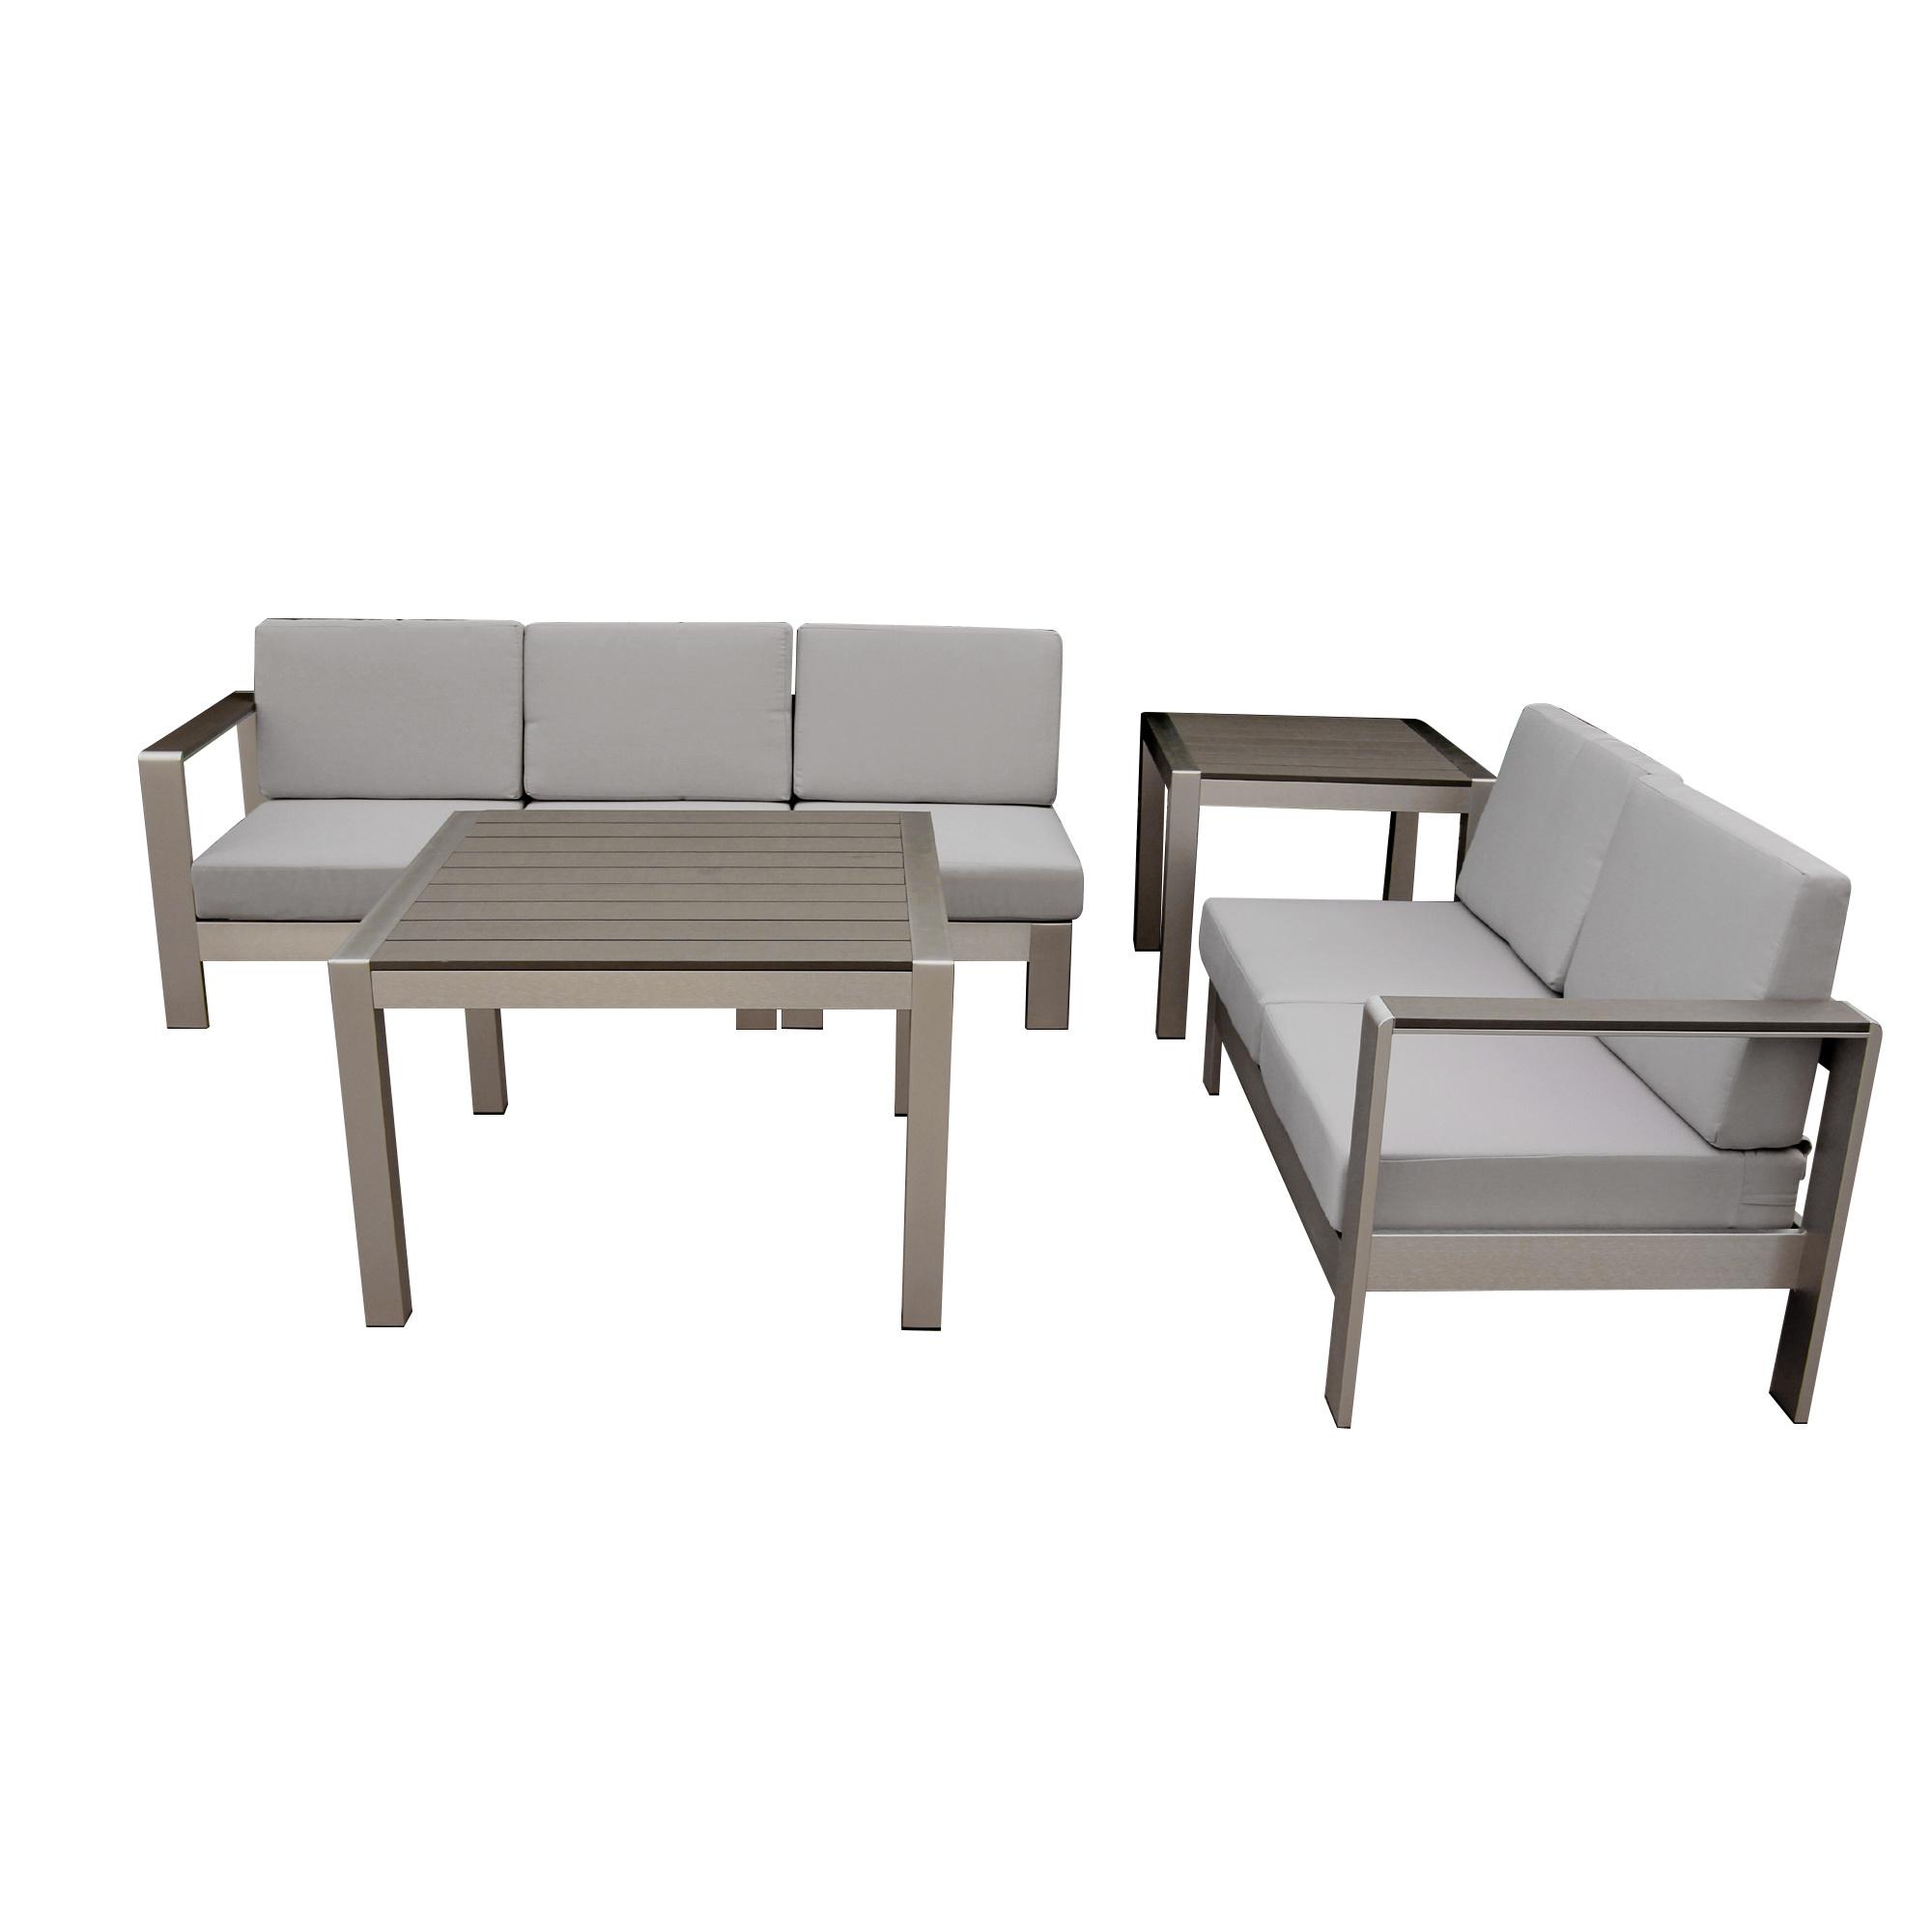 china garden outdoor furniture